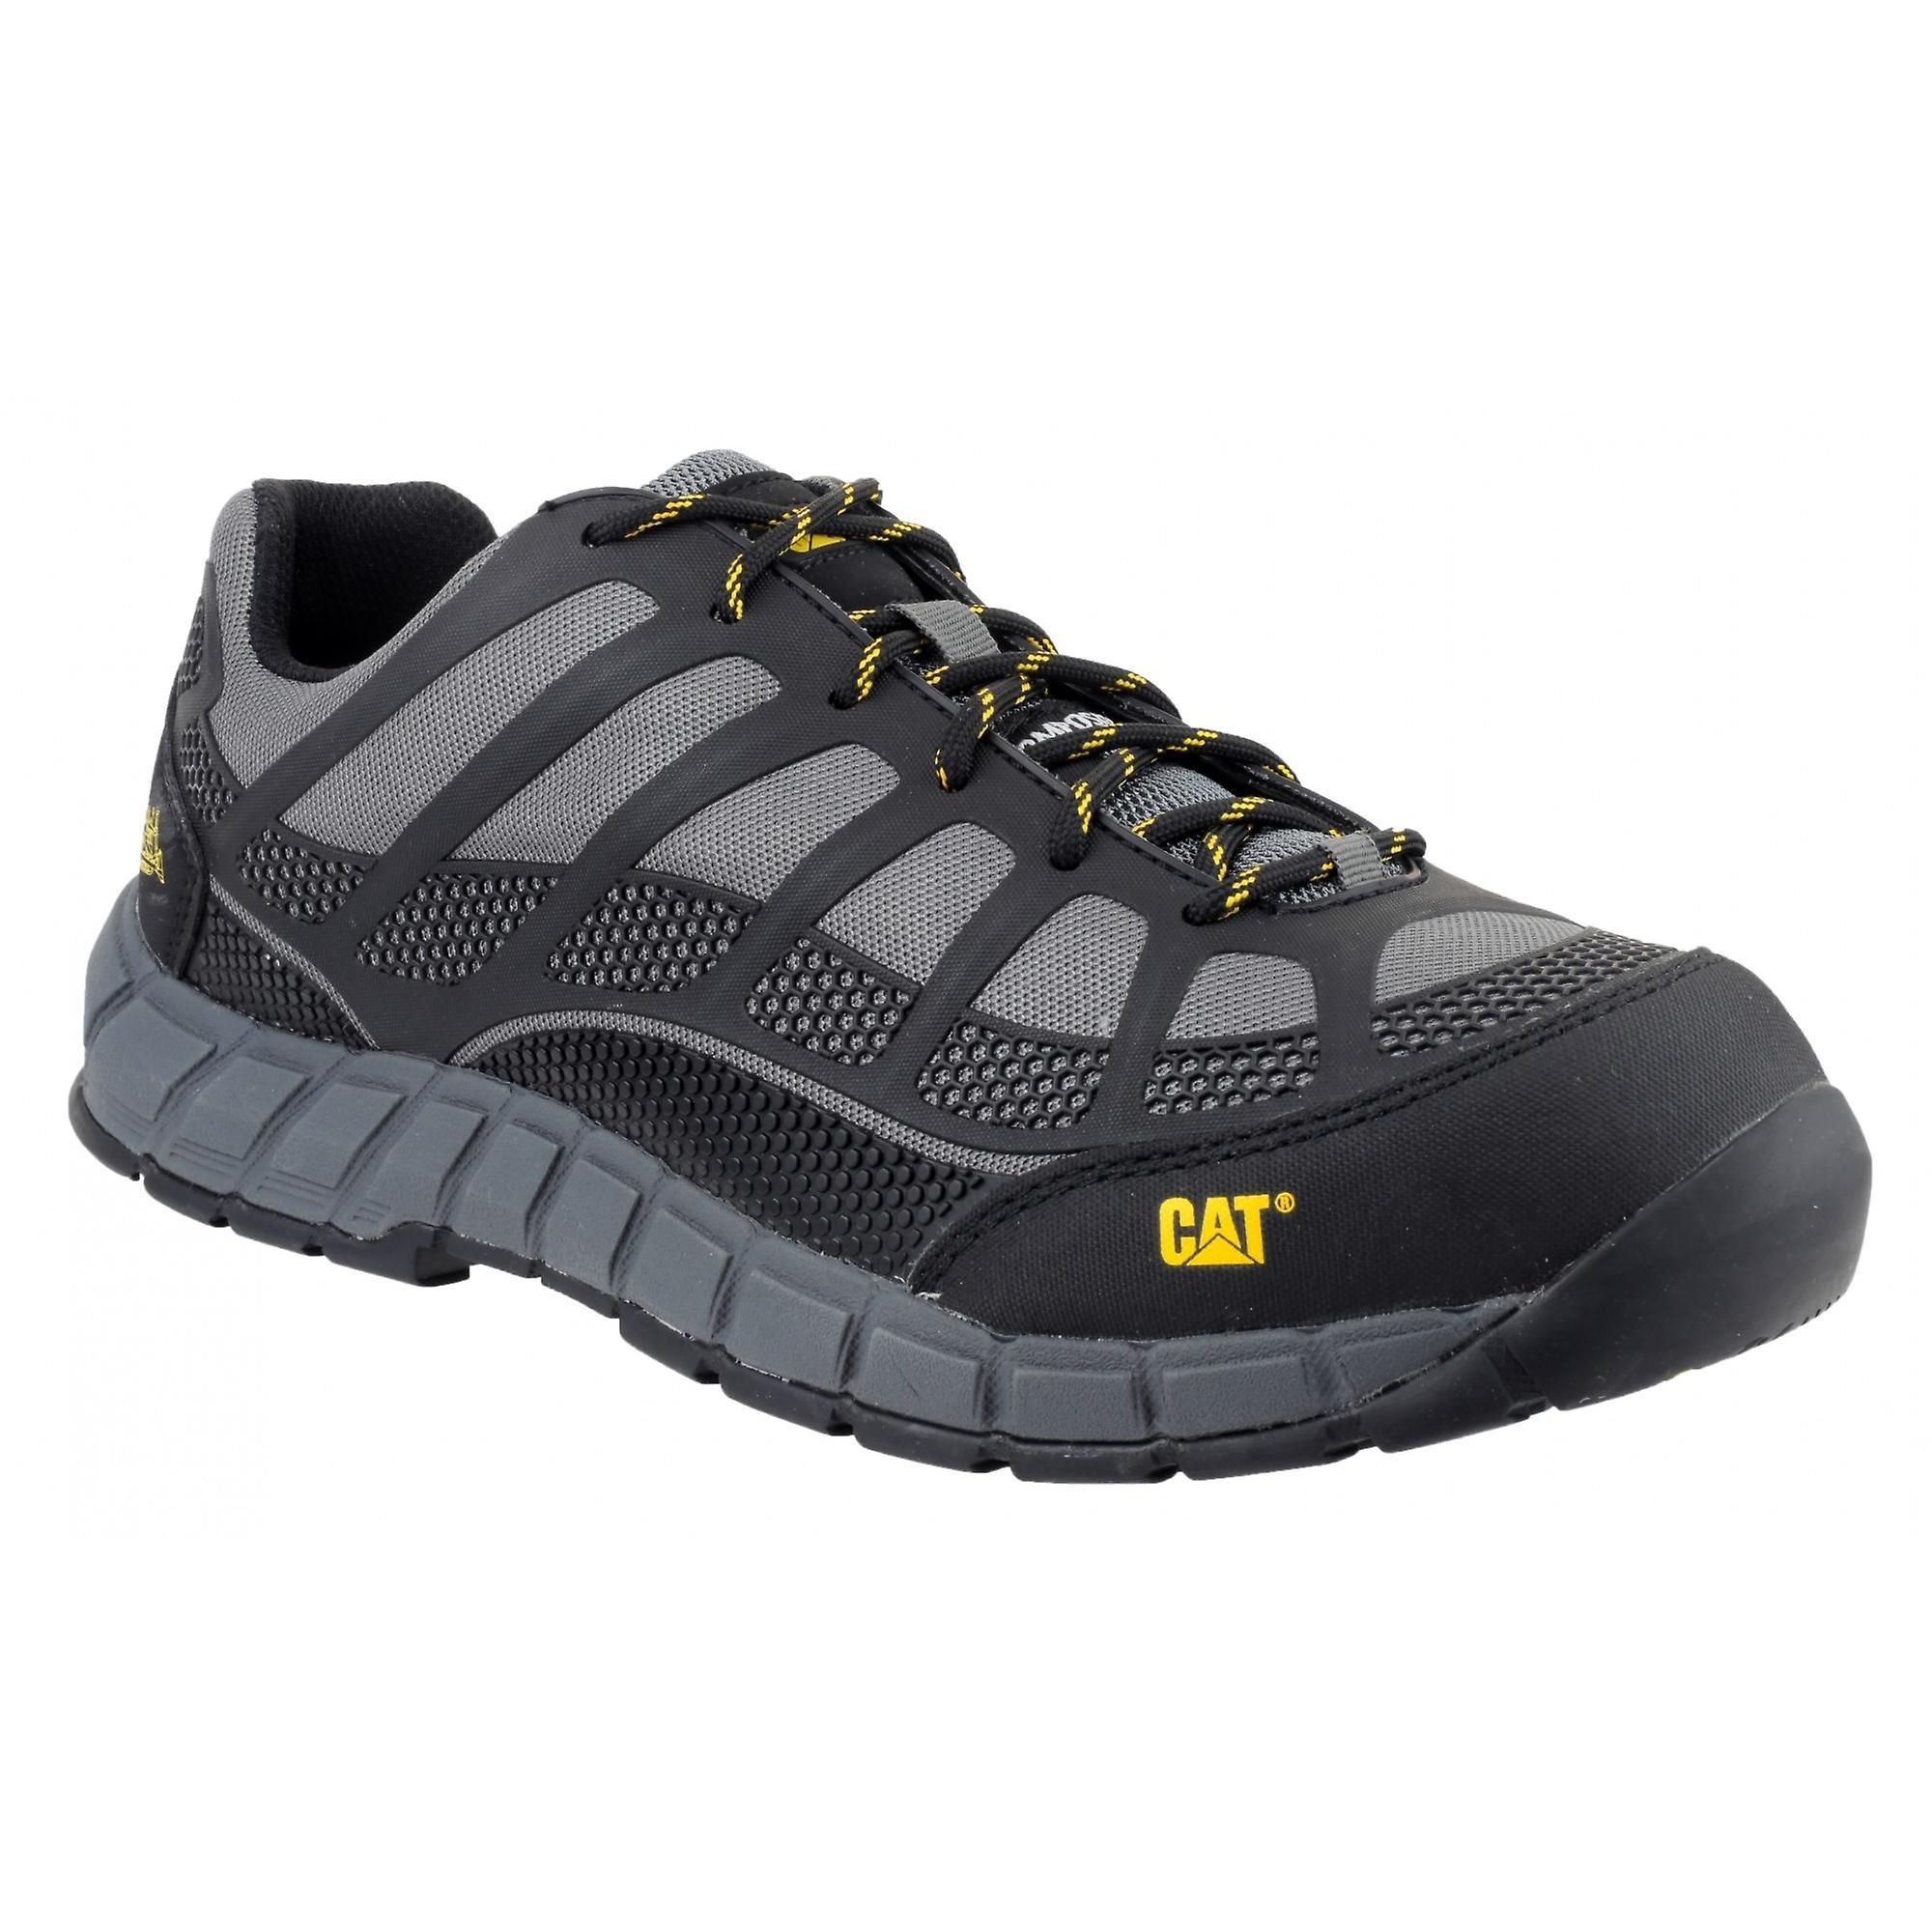 577fdc54 Caterpillar effektivisere S1P vernesko / Mens sko | Fruugo